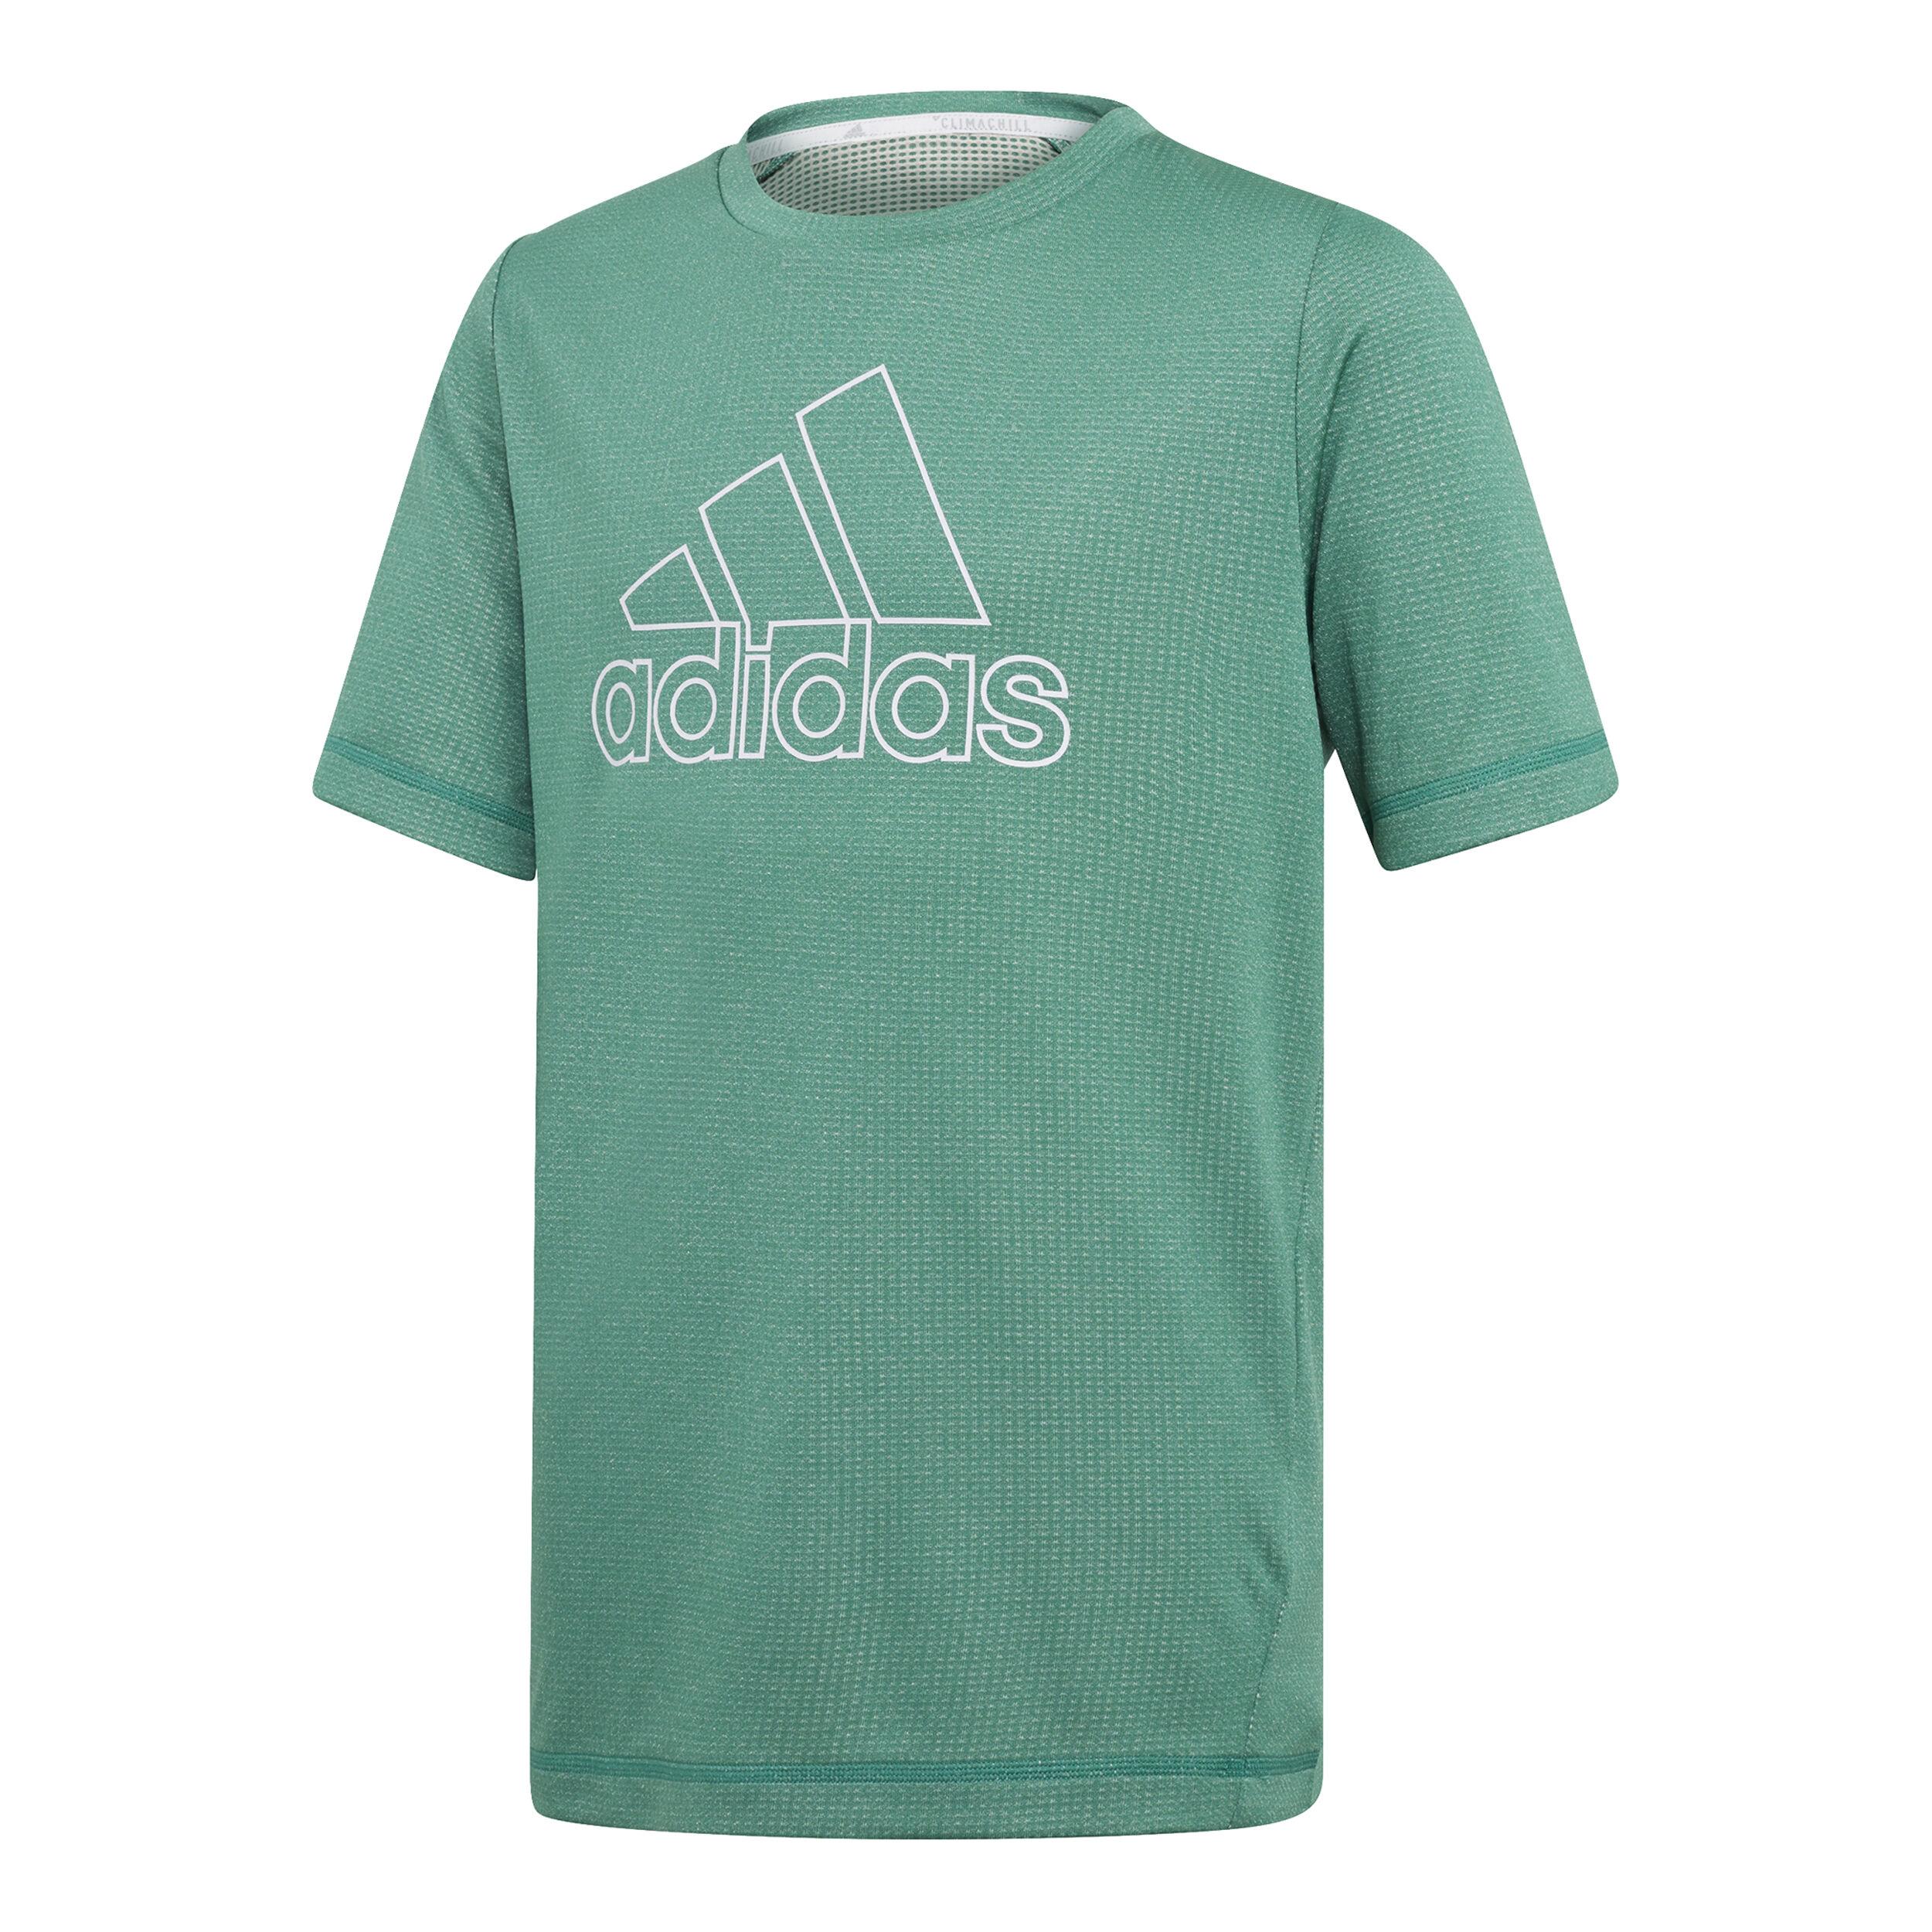 adidas Climachill T Shirt Jungen Mint, Weiß online kaufen